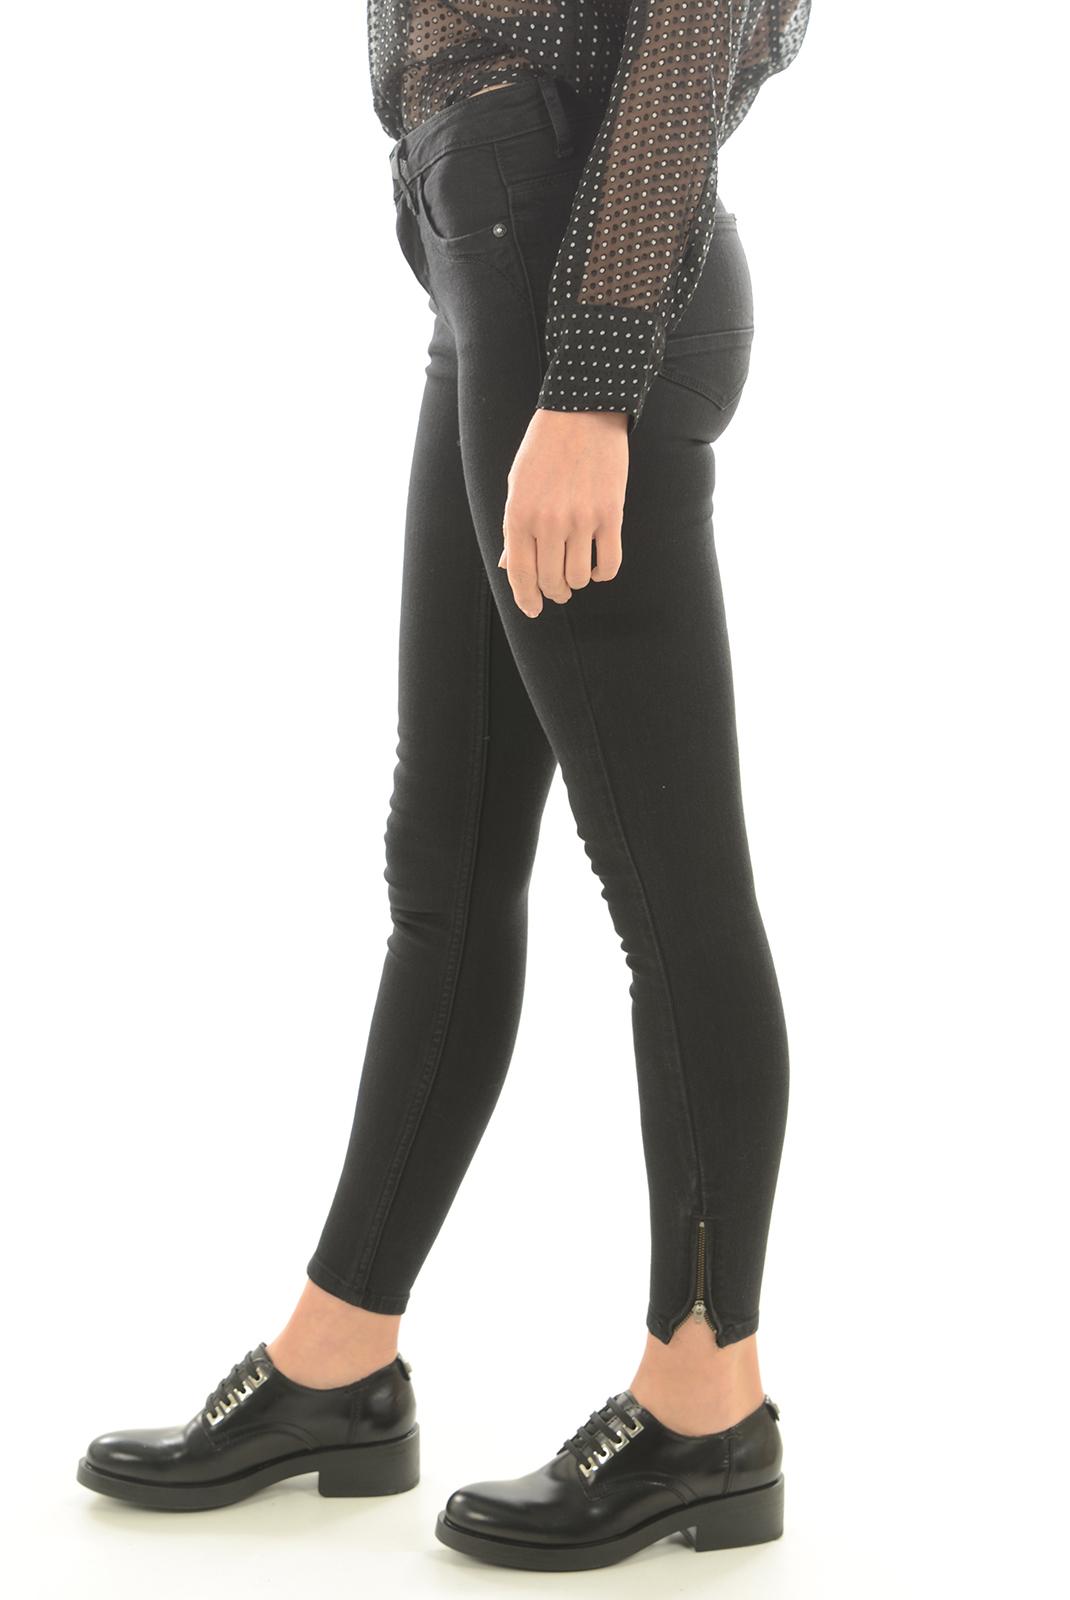 Jeans   Only KENDELL ETERNAL ANKLE NOOS BLACK